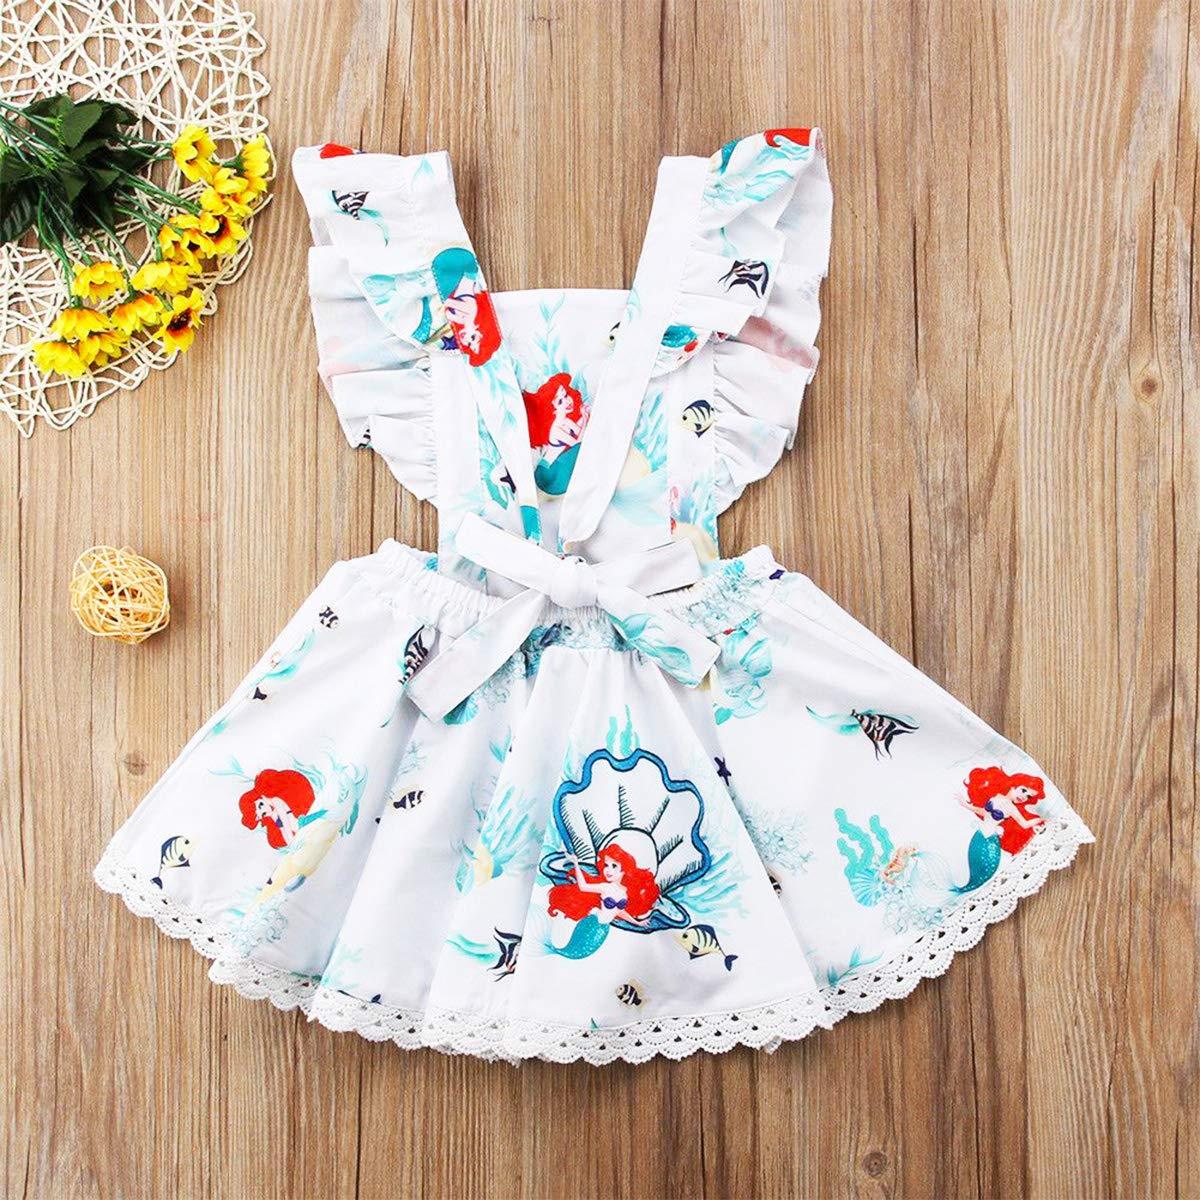 YOHA Baby Girls Ruffle Jumper Dress Suspender Skirts Pinafore Toddler Dress